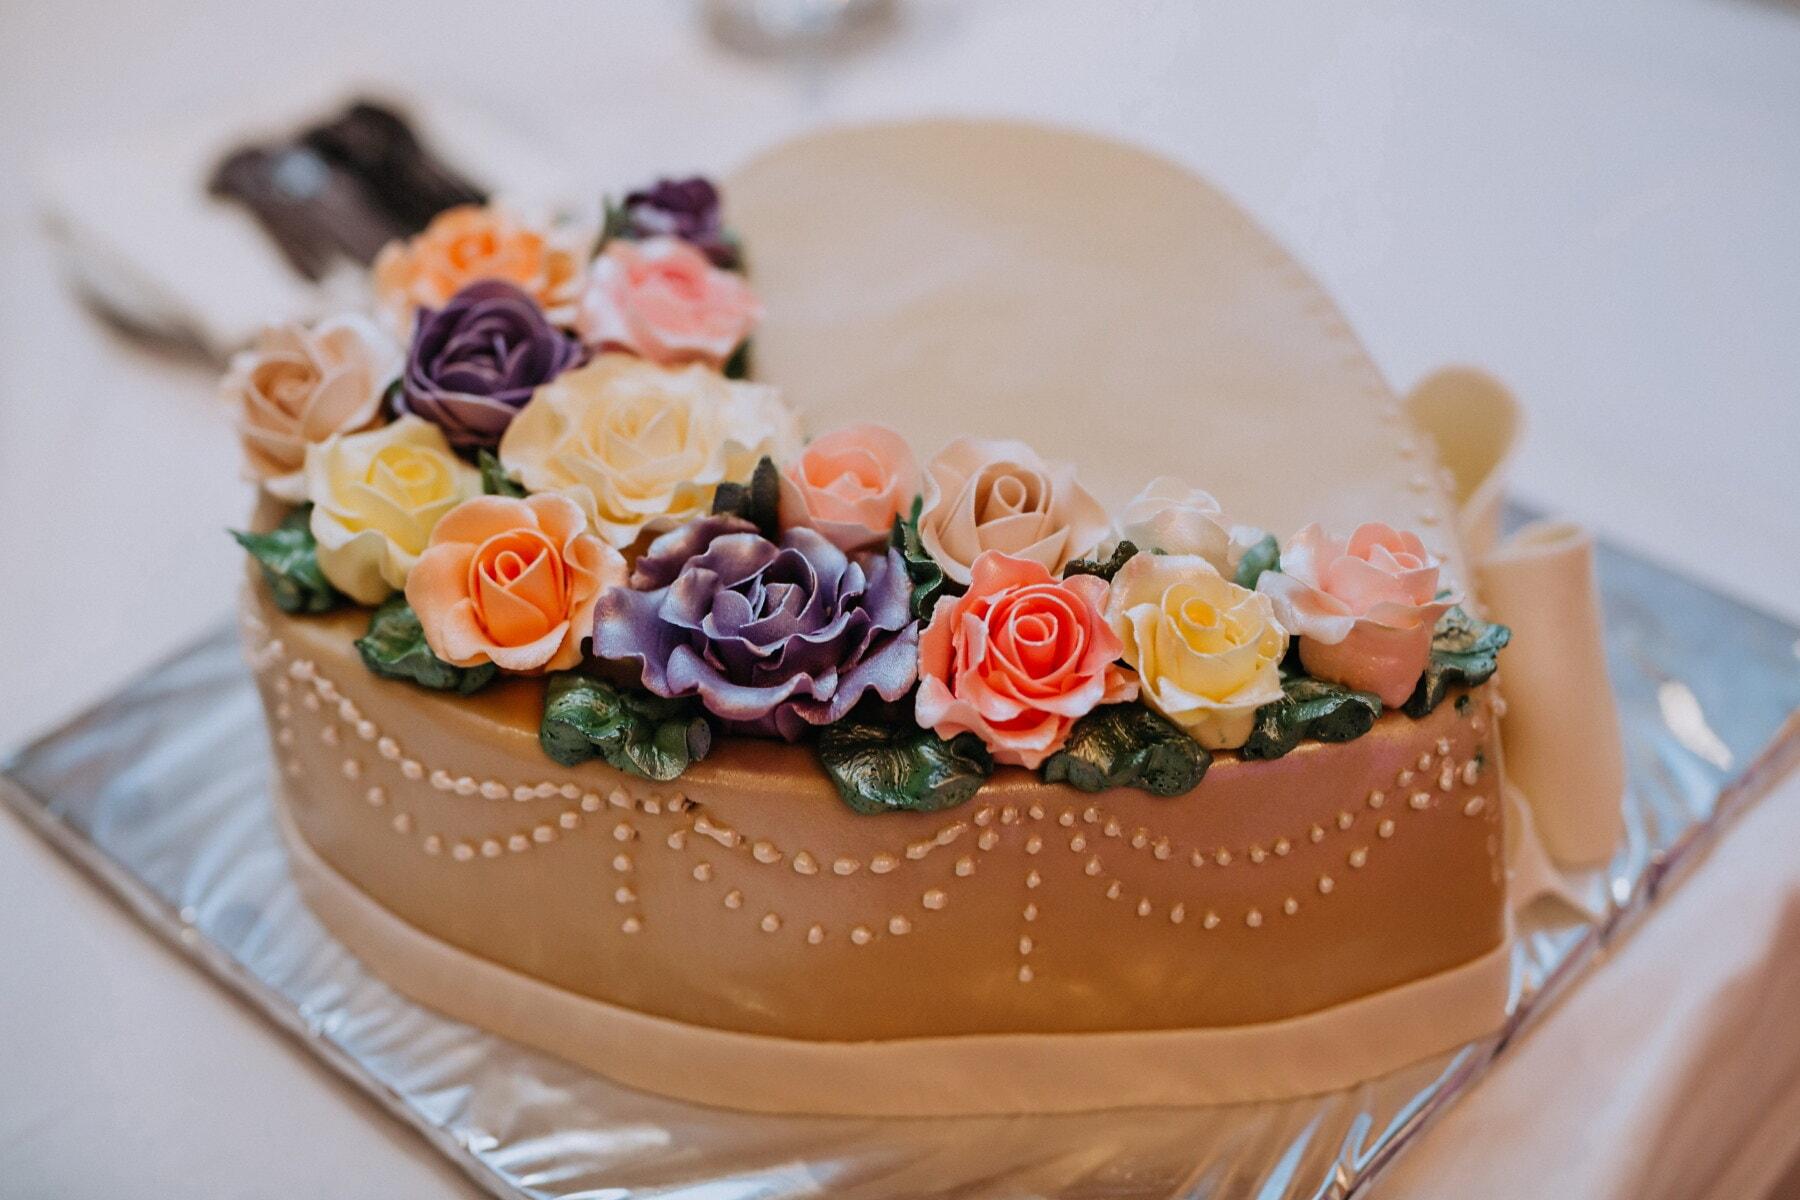 Herz, Form, Dessert, Kuchen, Romantik, Essen, Blume, Gebäck, süß, stieg